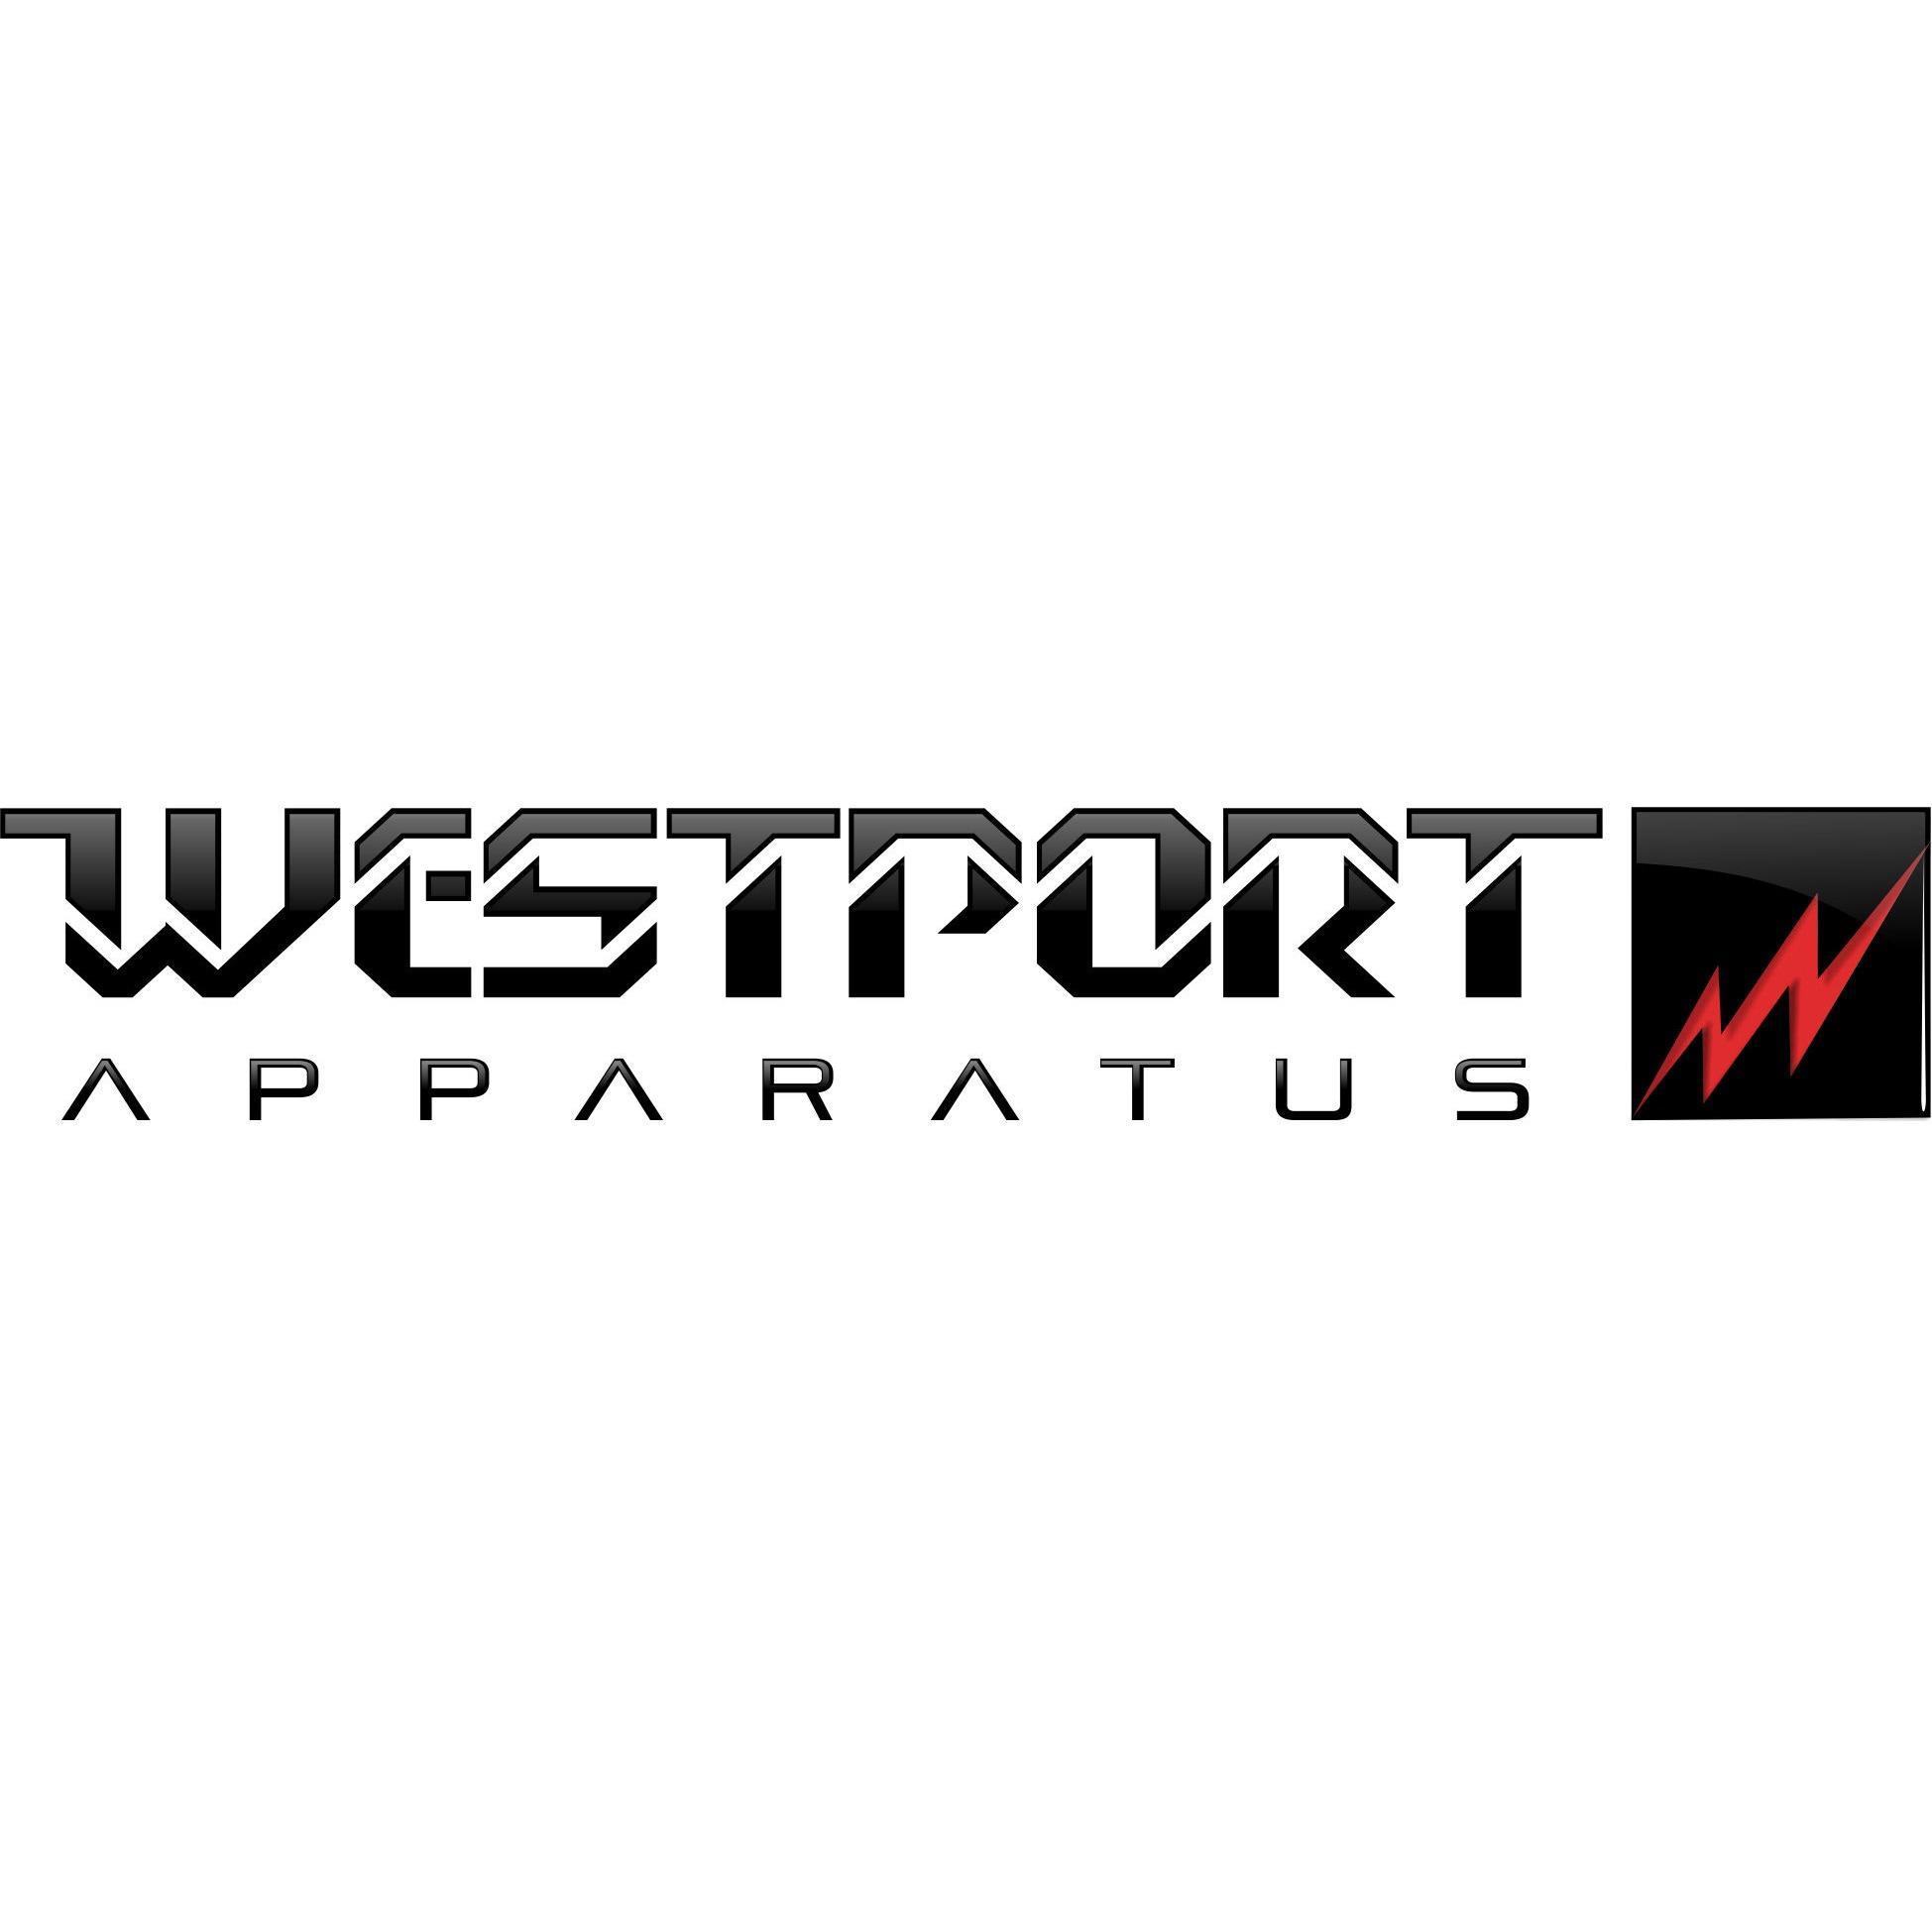 Westport Apparatus